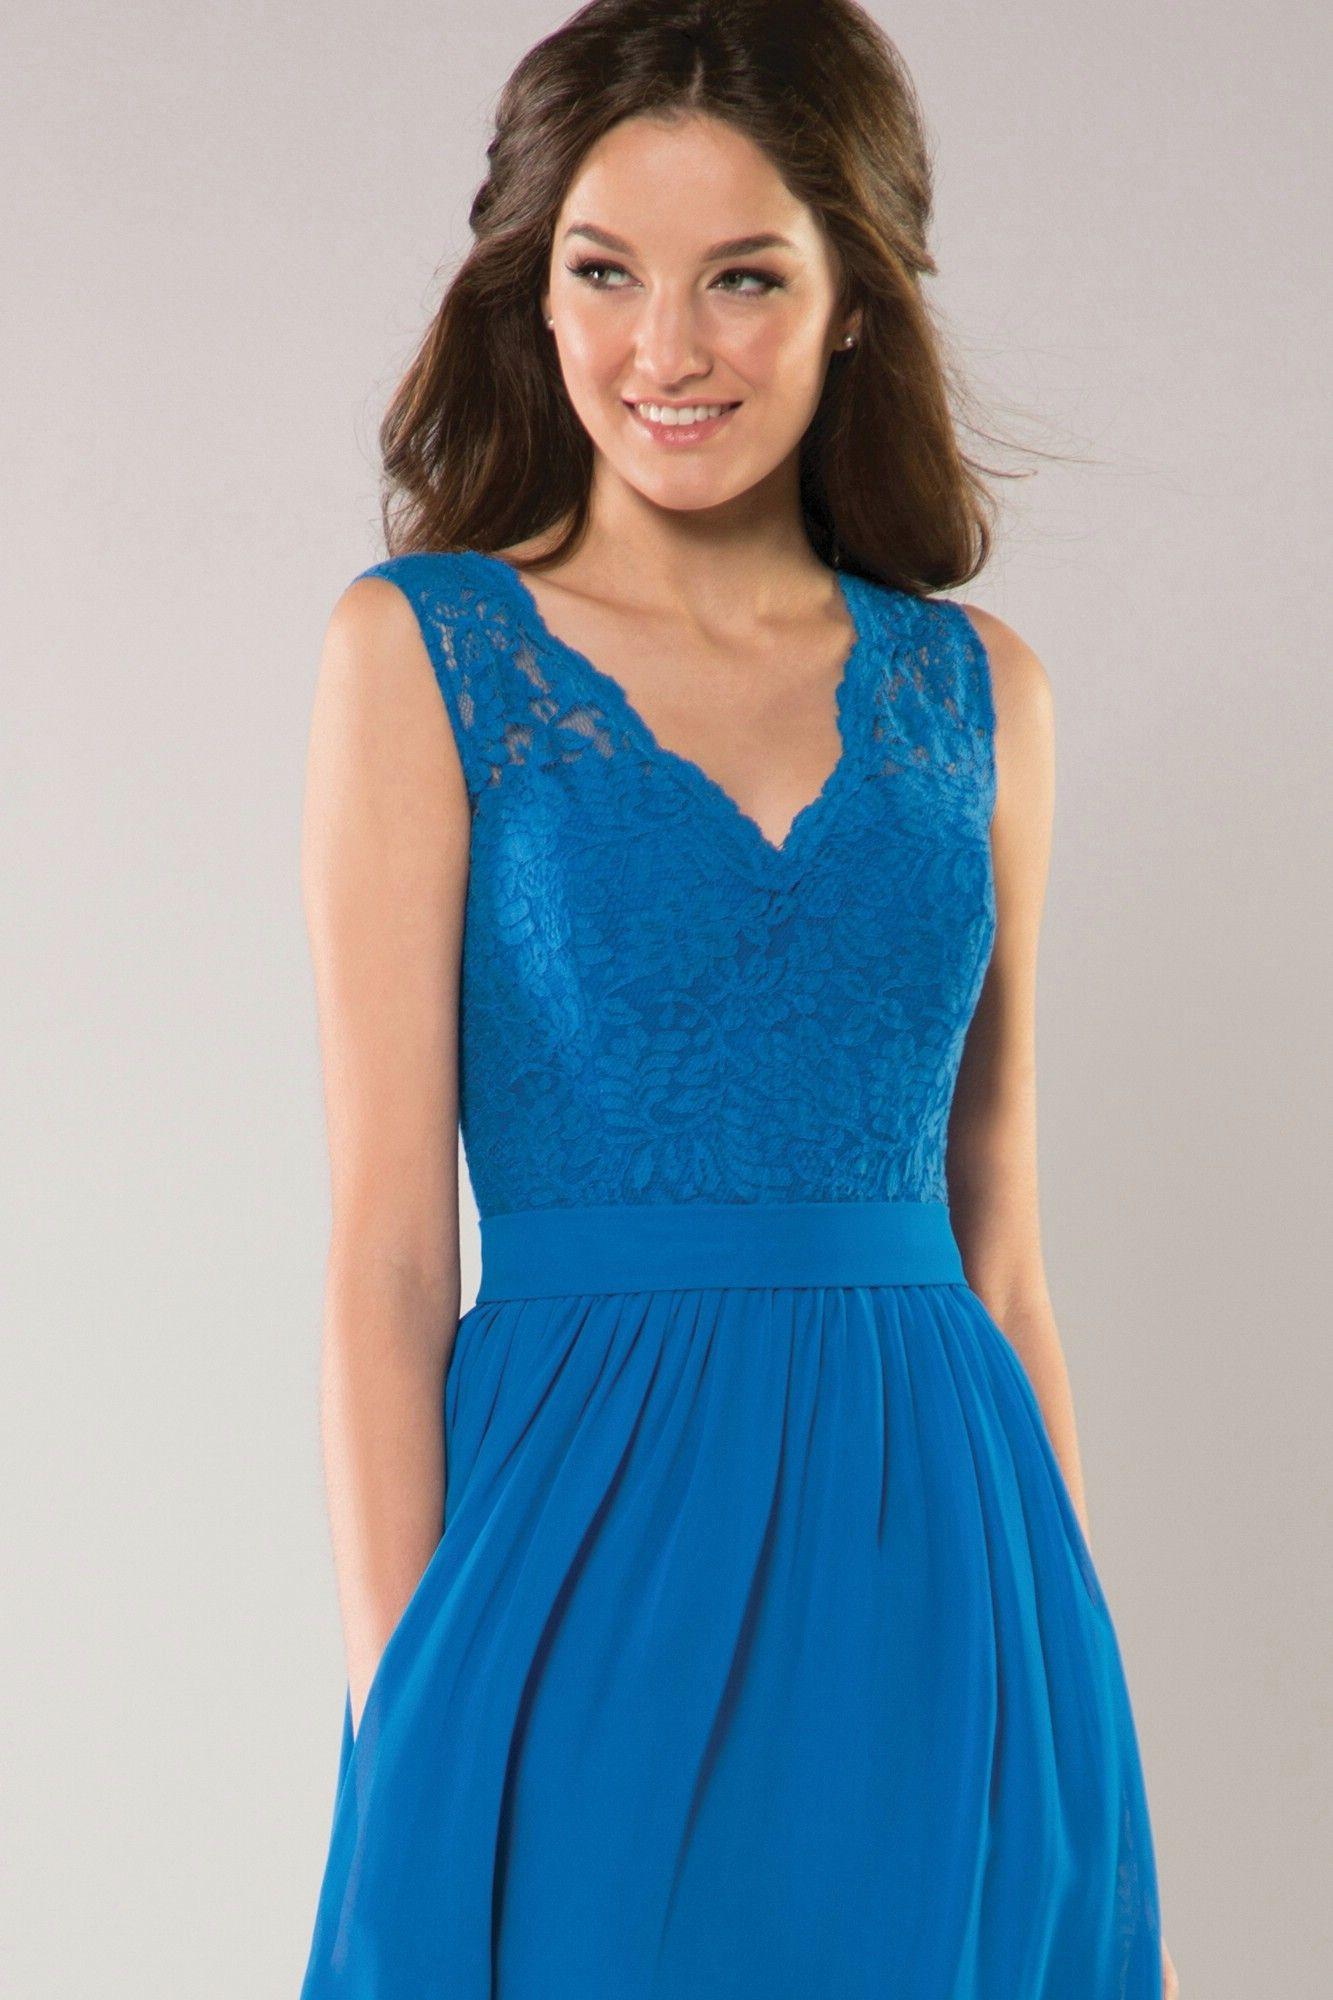 Jasmine B2 Bridesmaid Dresses - Style B163058 | Town Center ...